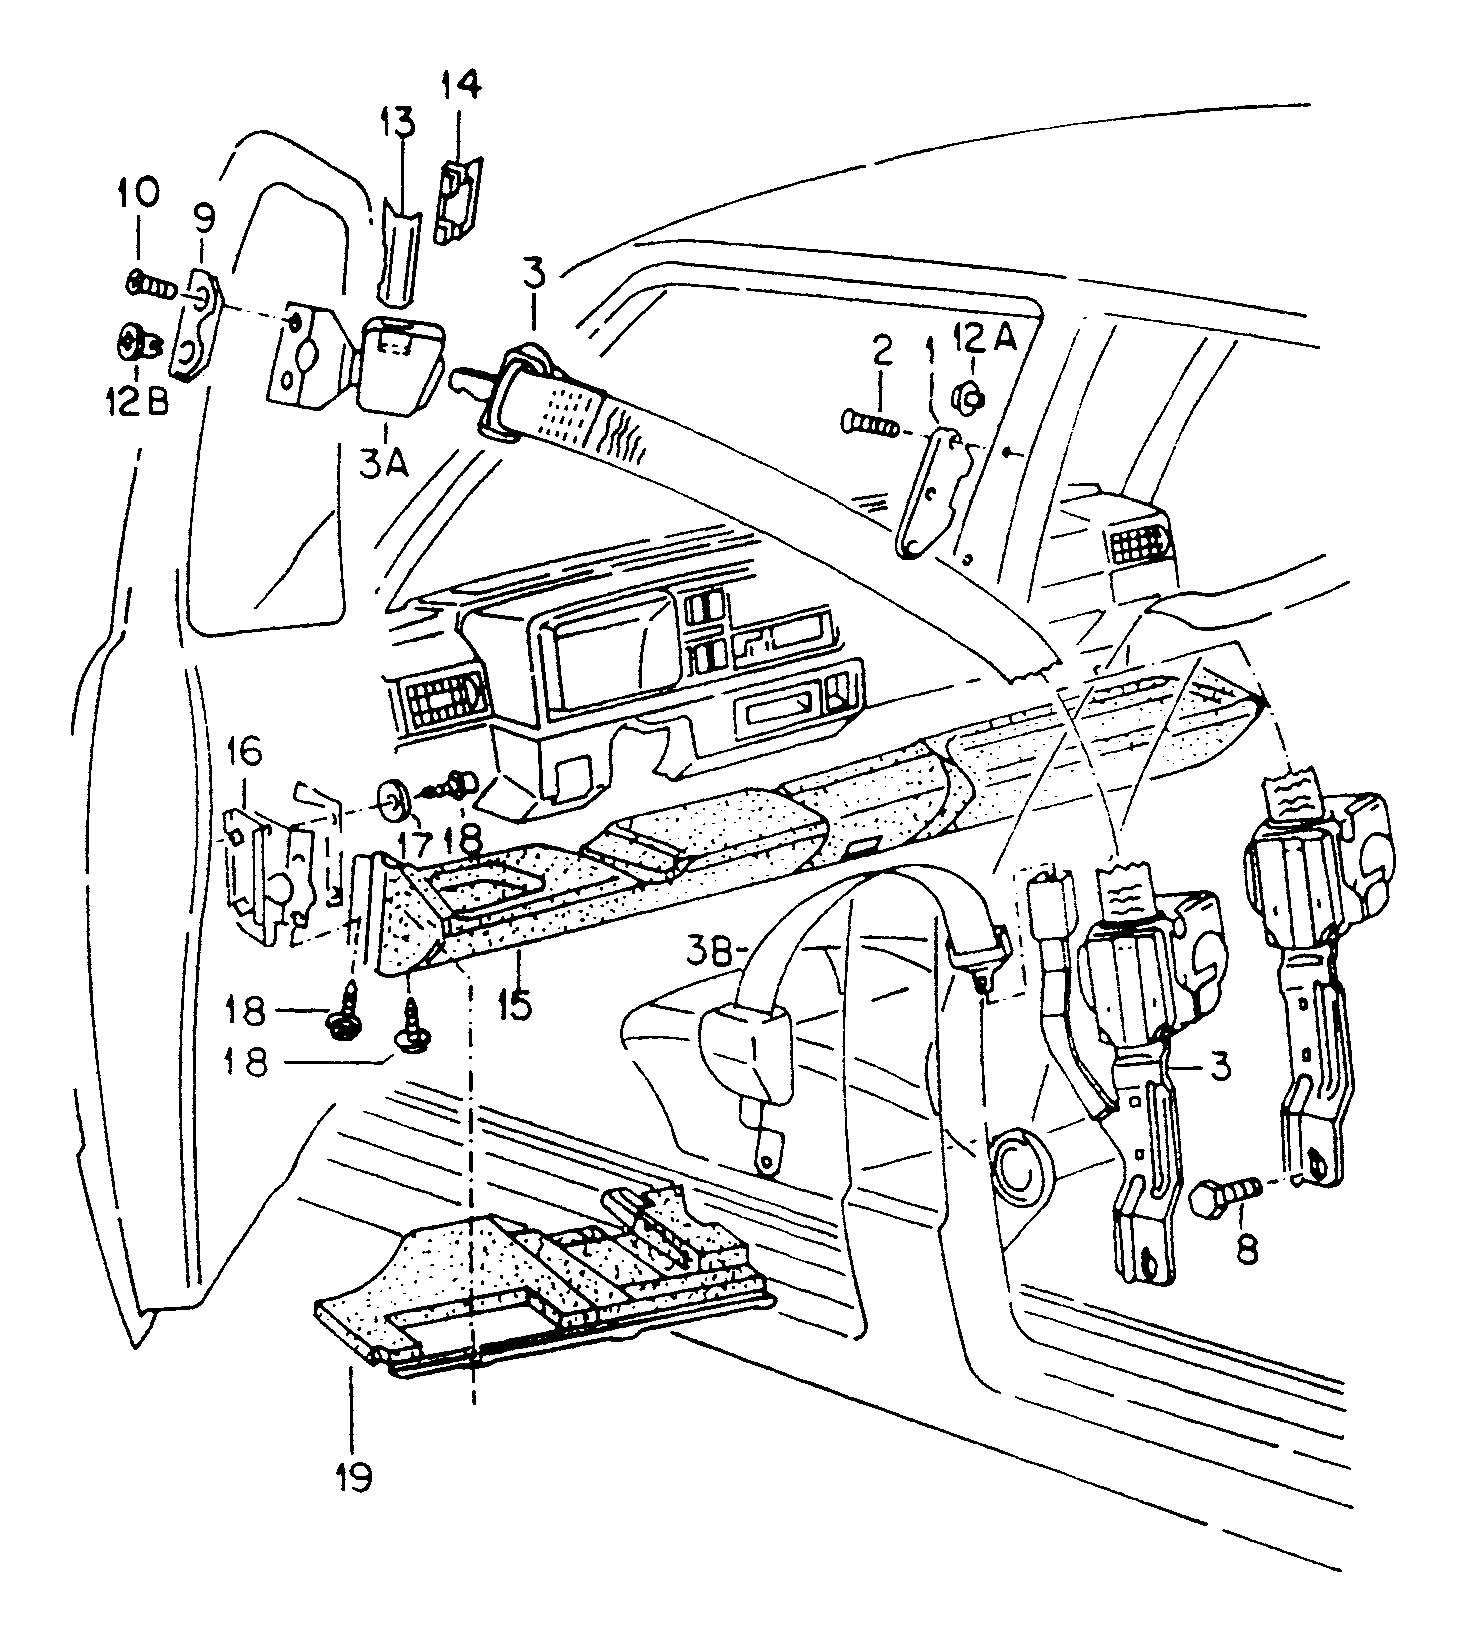 2 Point Seat Belt Knee Bar Front